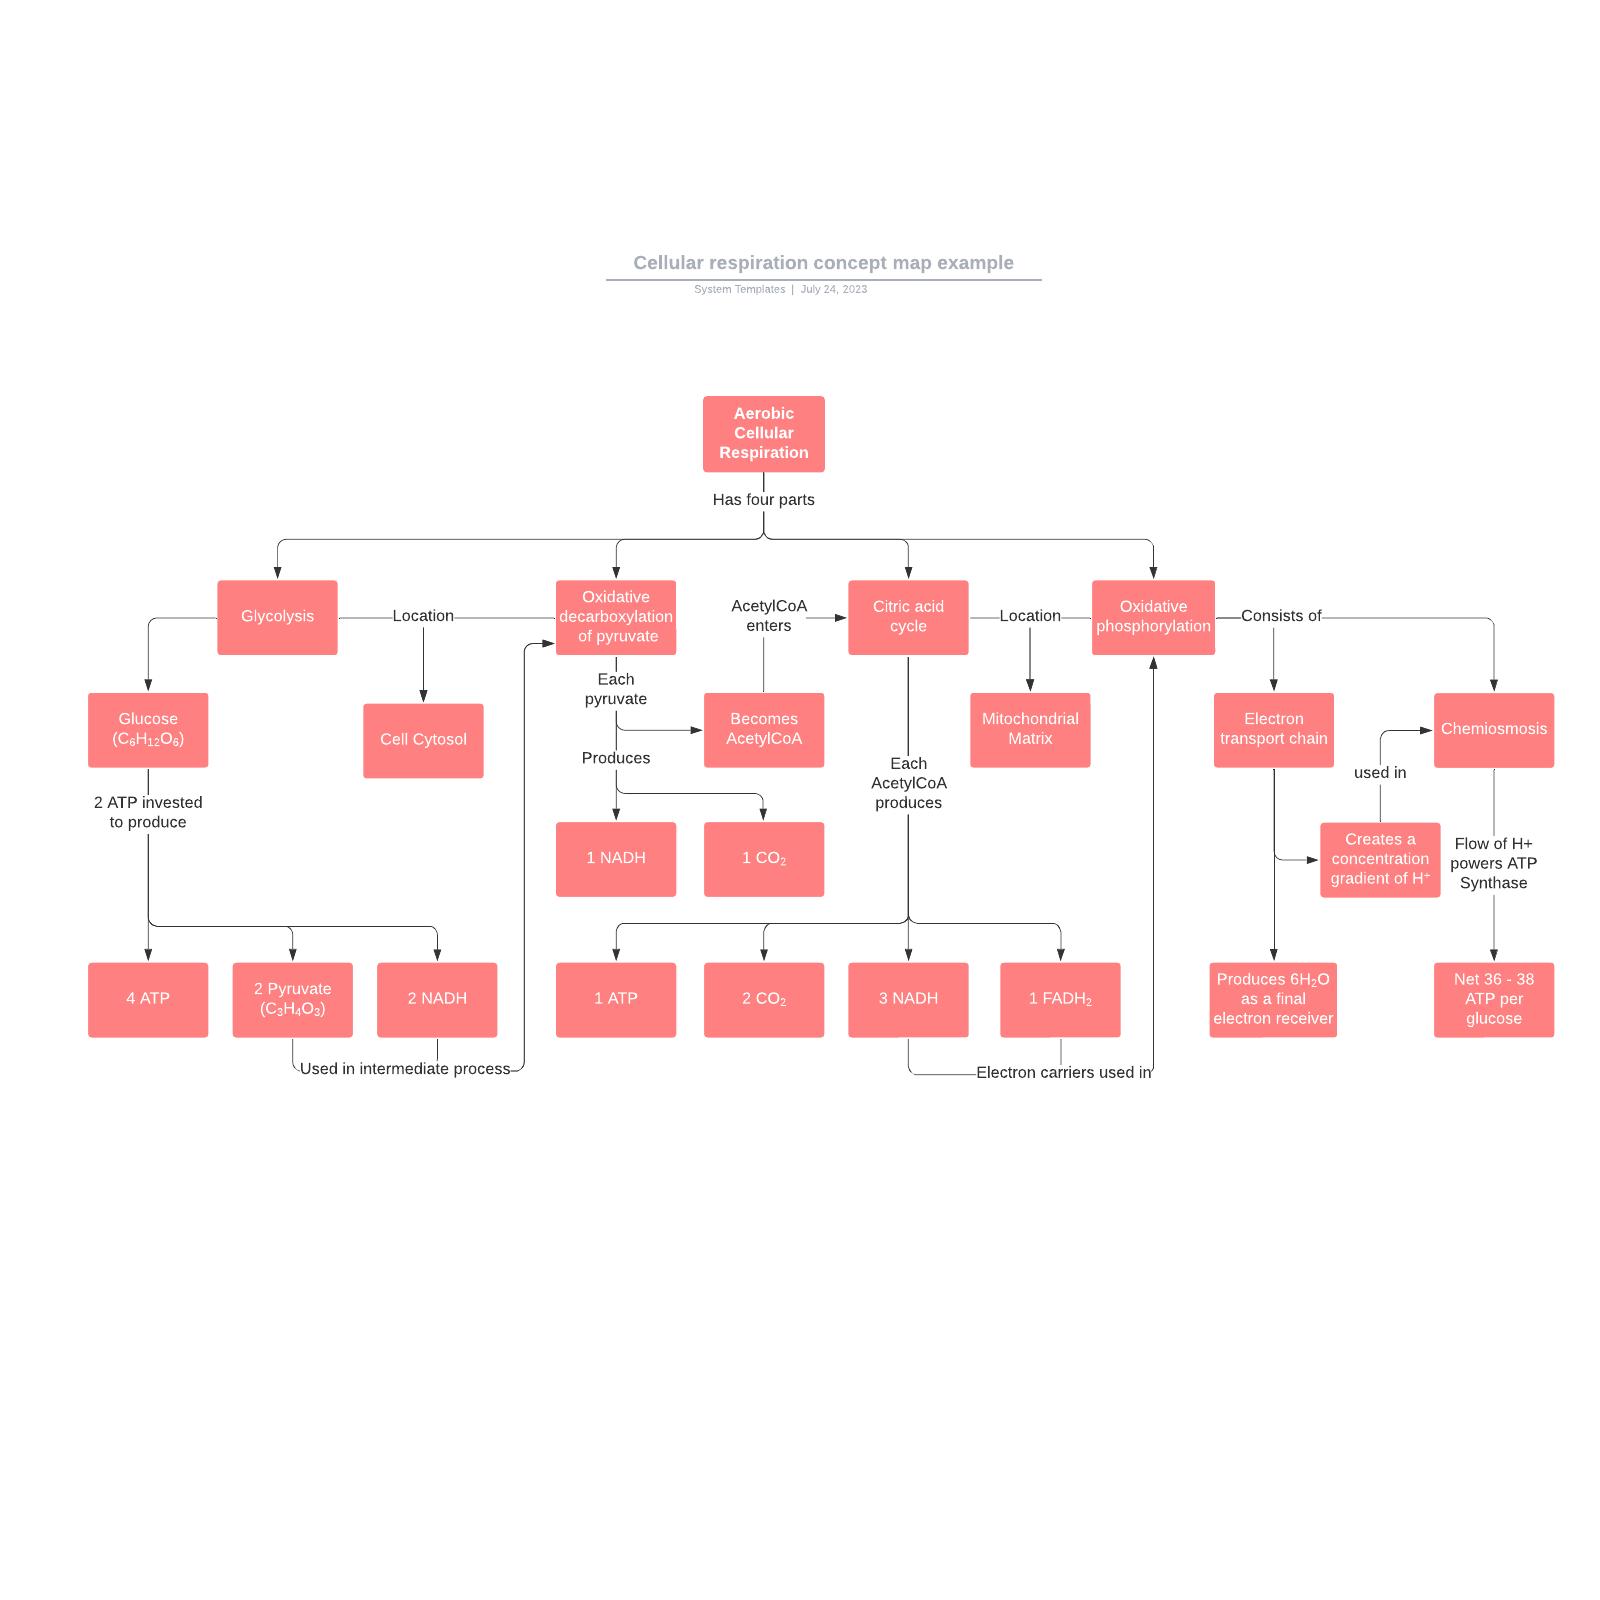 Cellular respiration concept map example